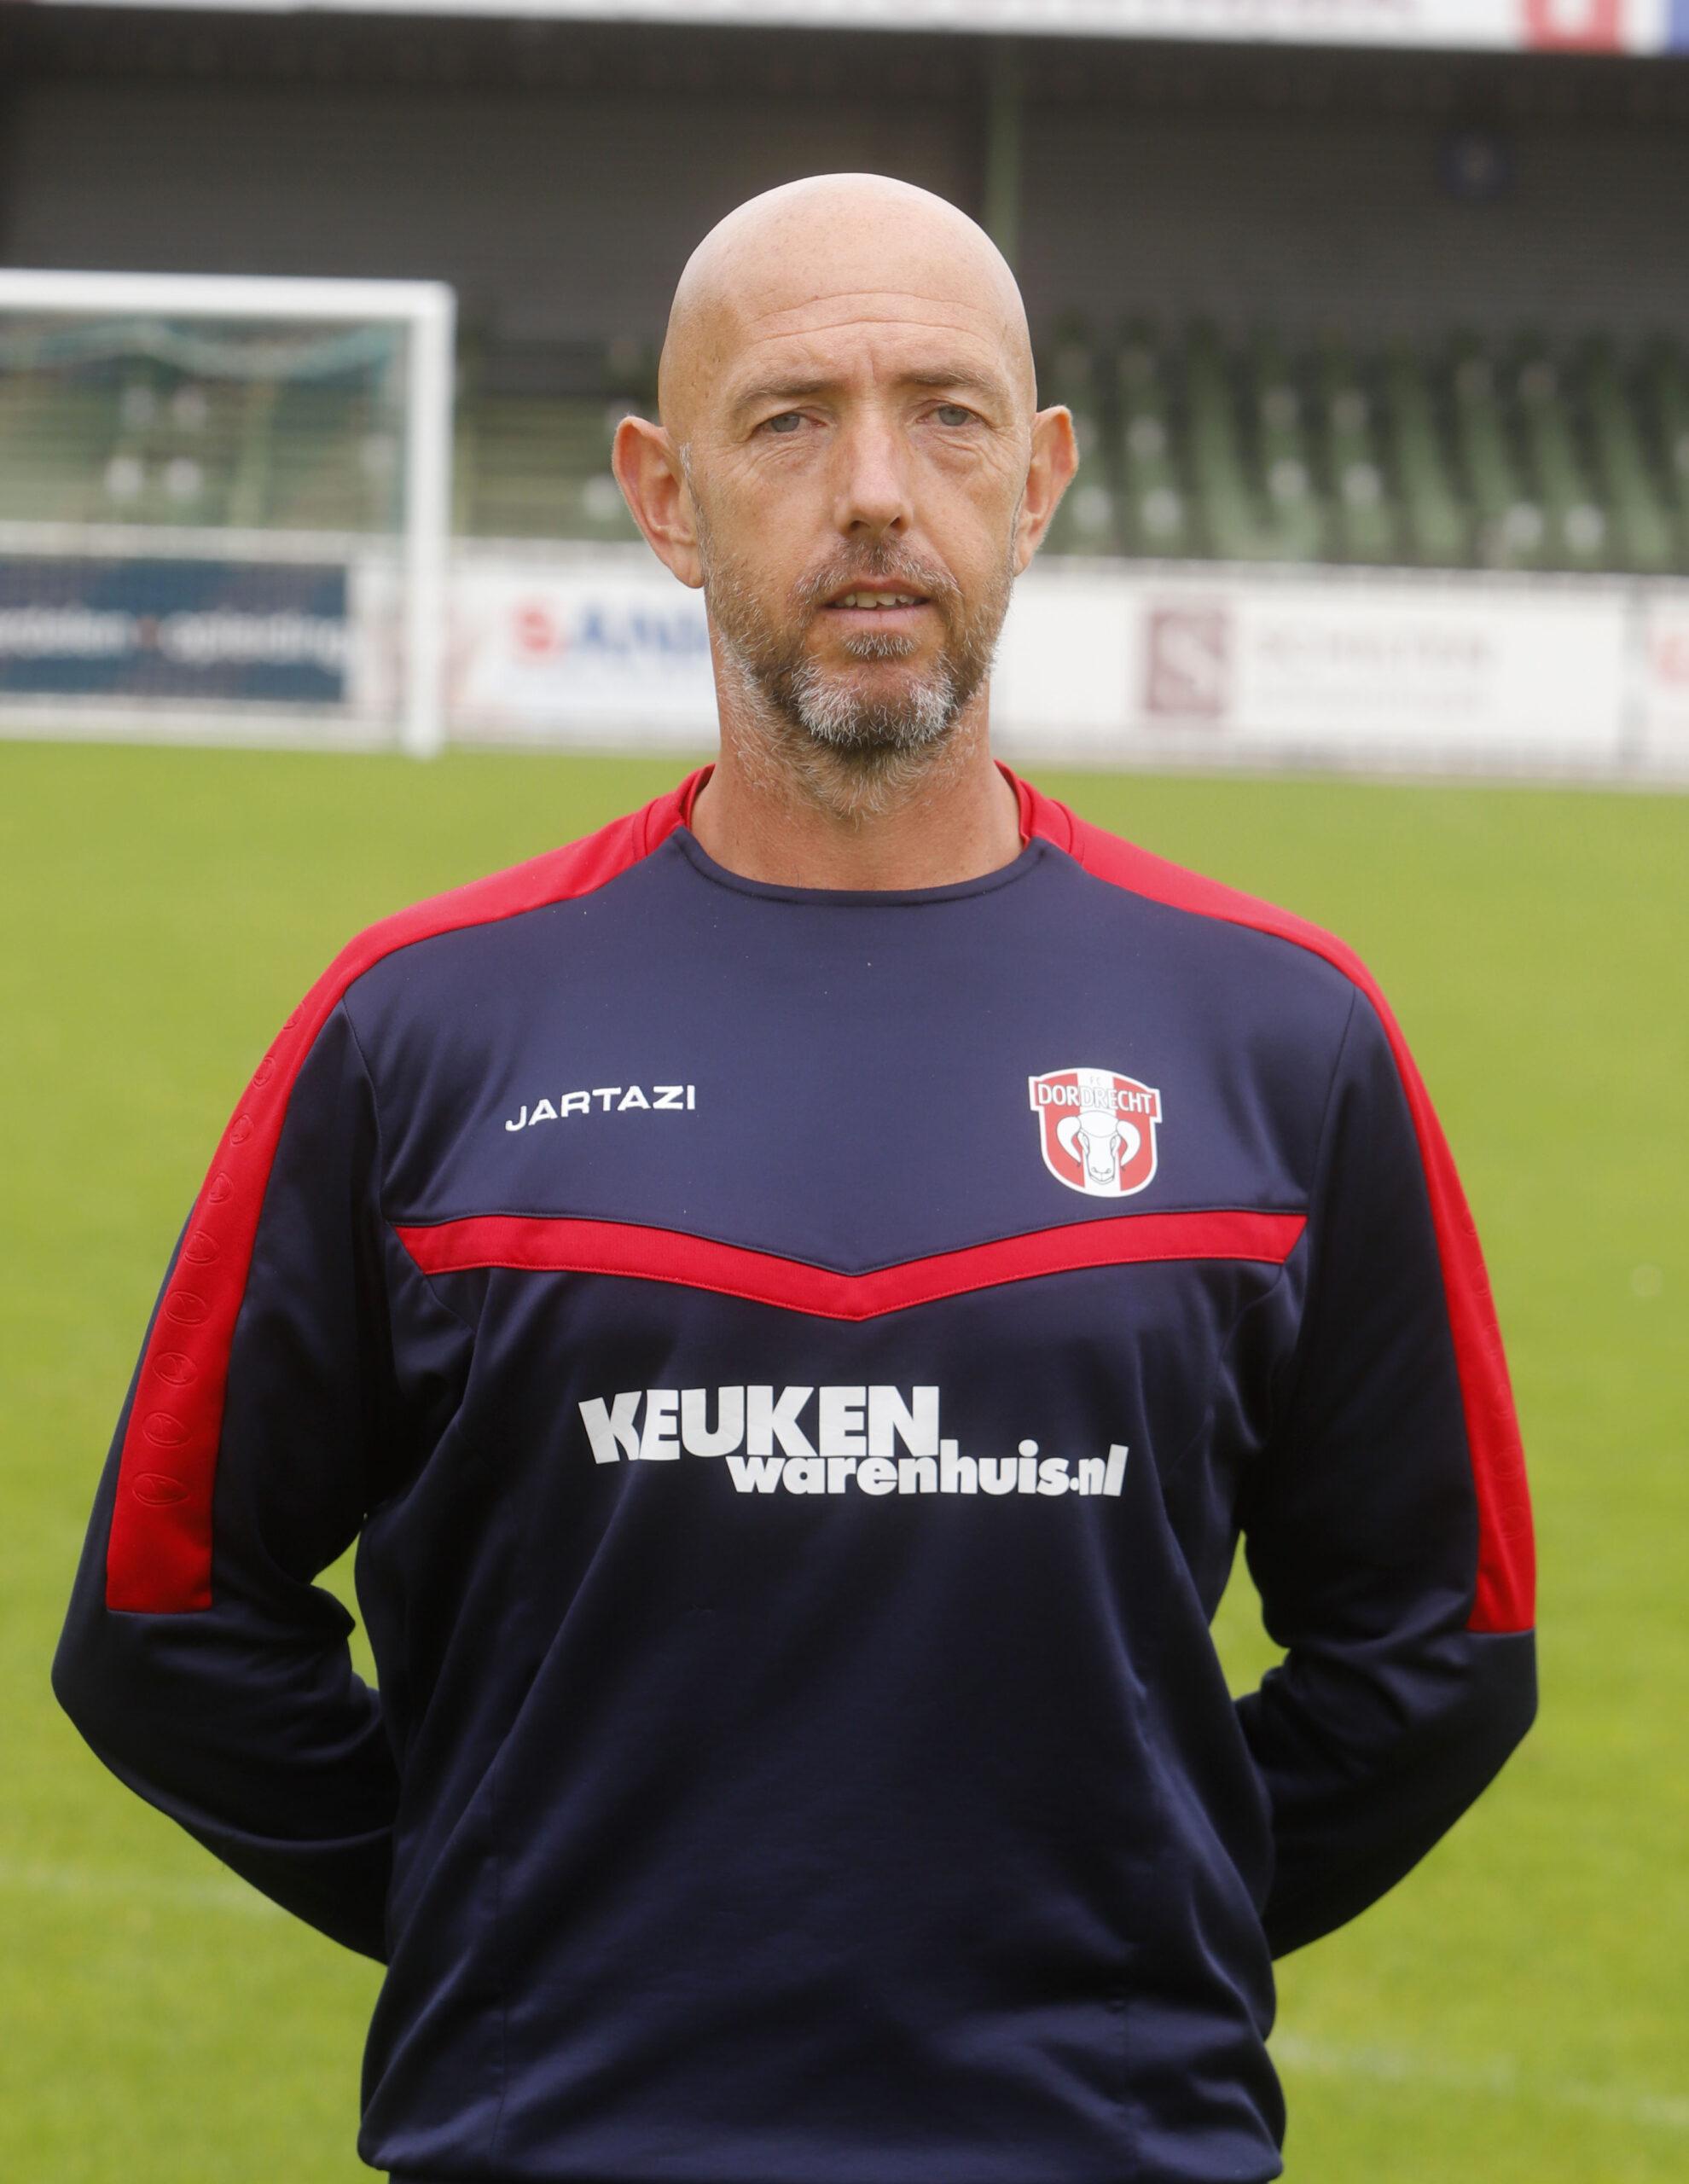 Michael Koedam